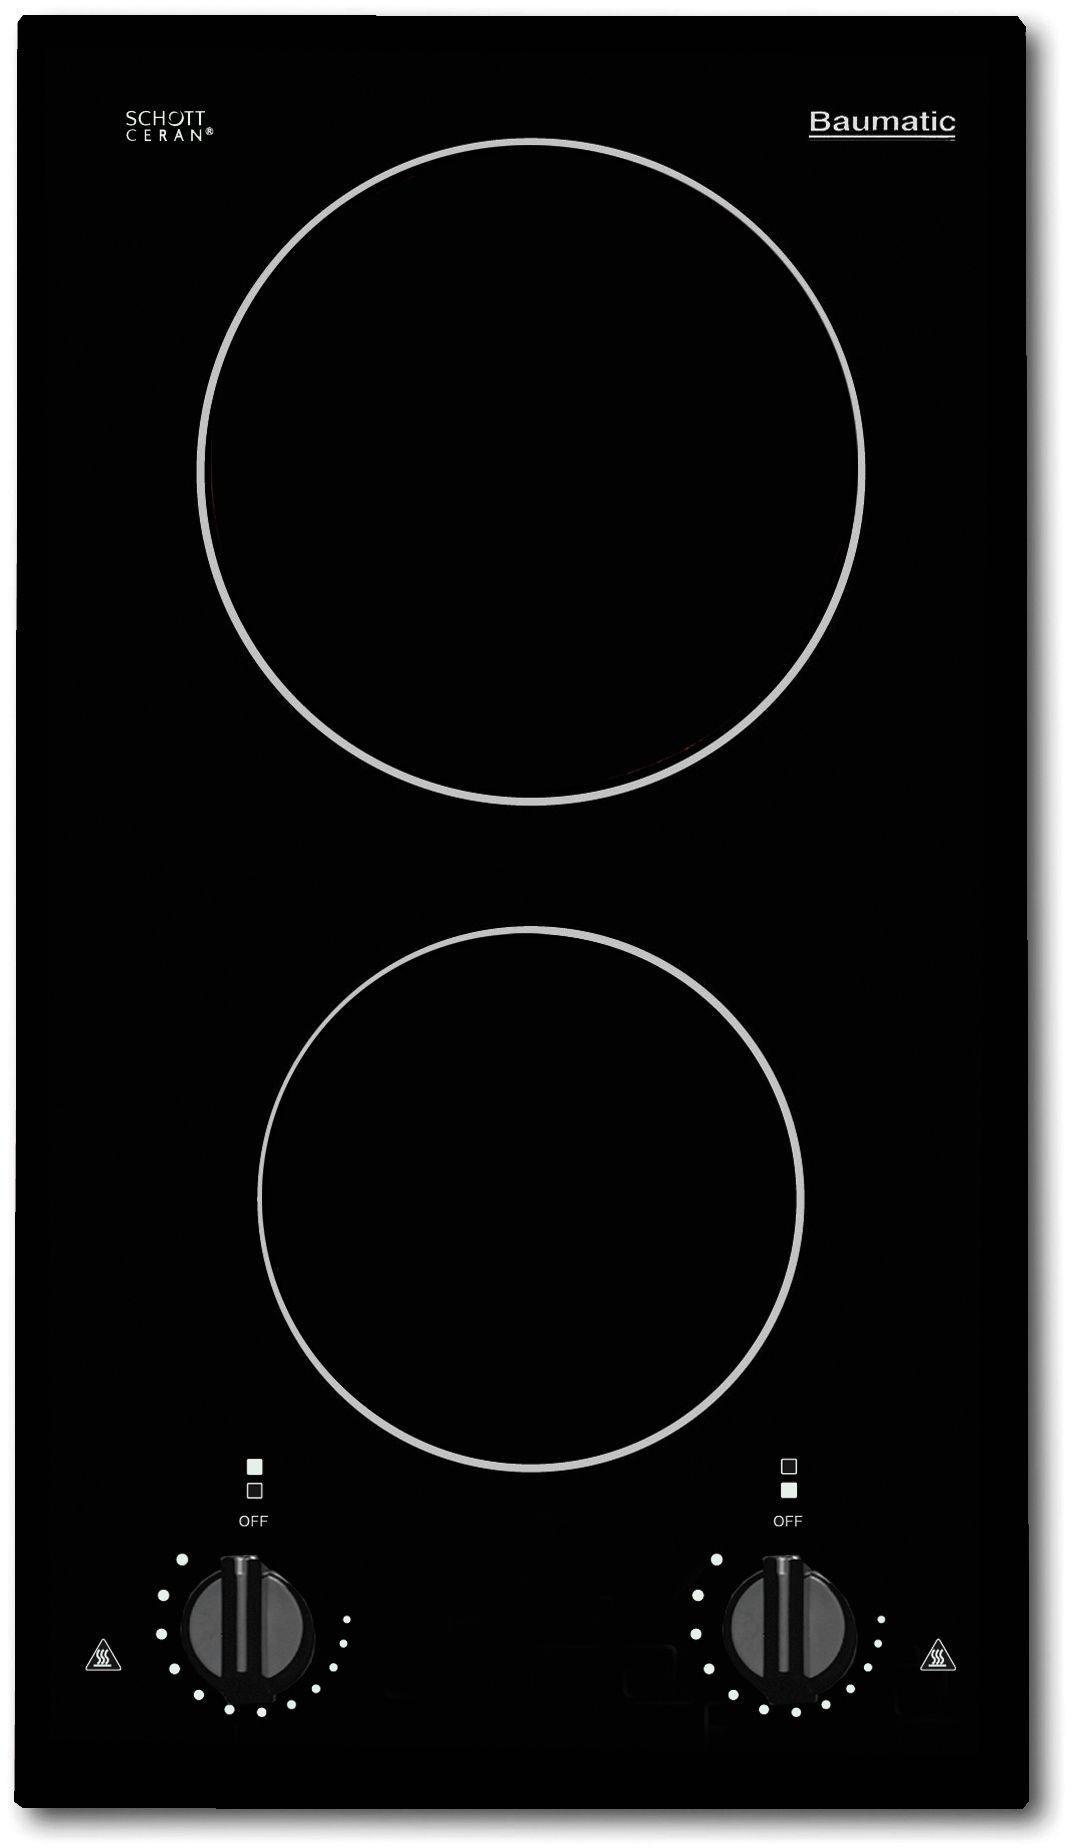 Image of Baumatic BHC300 Ceramic Electric Hob - Black.